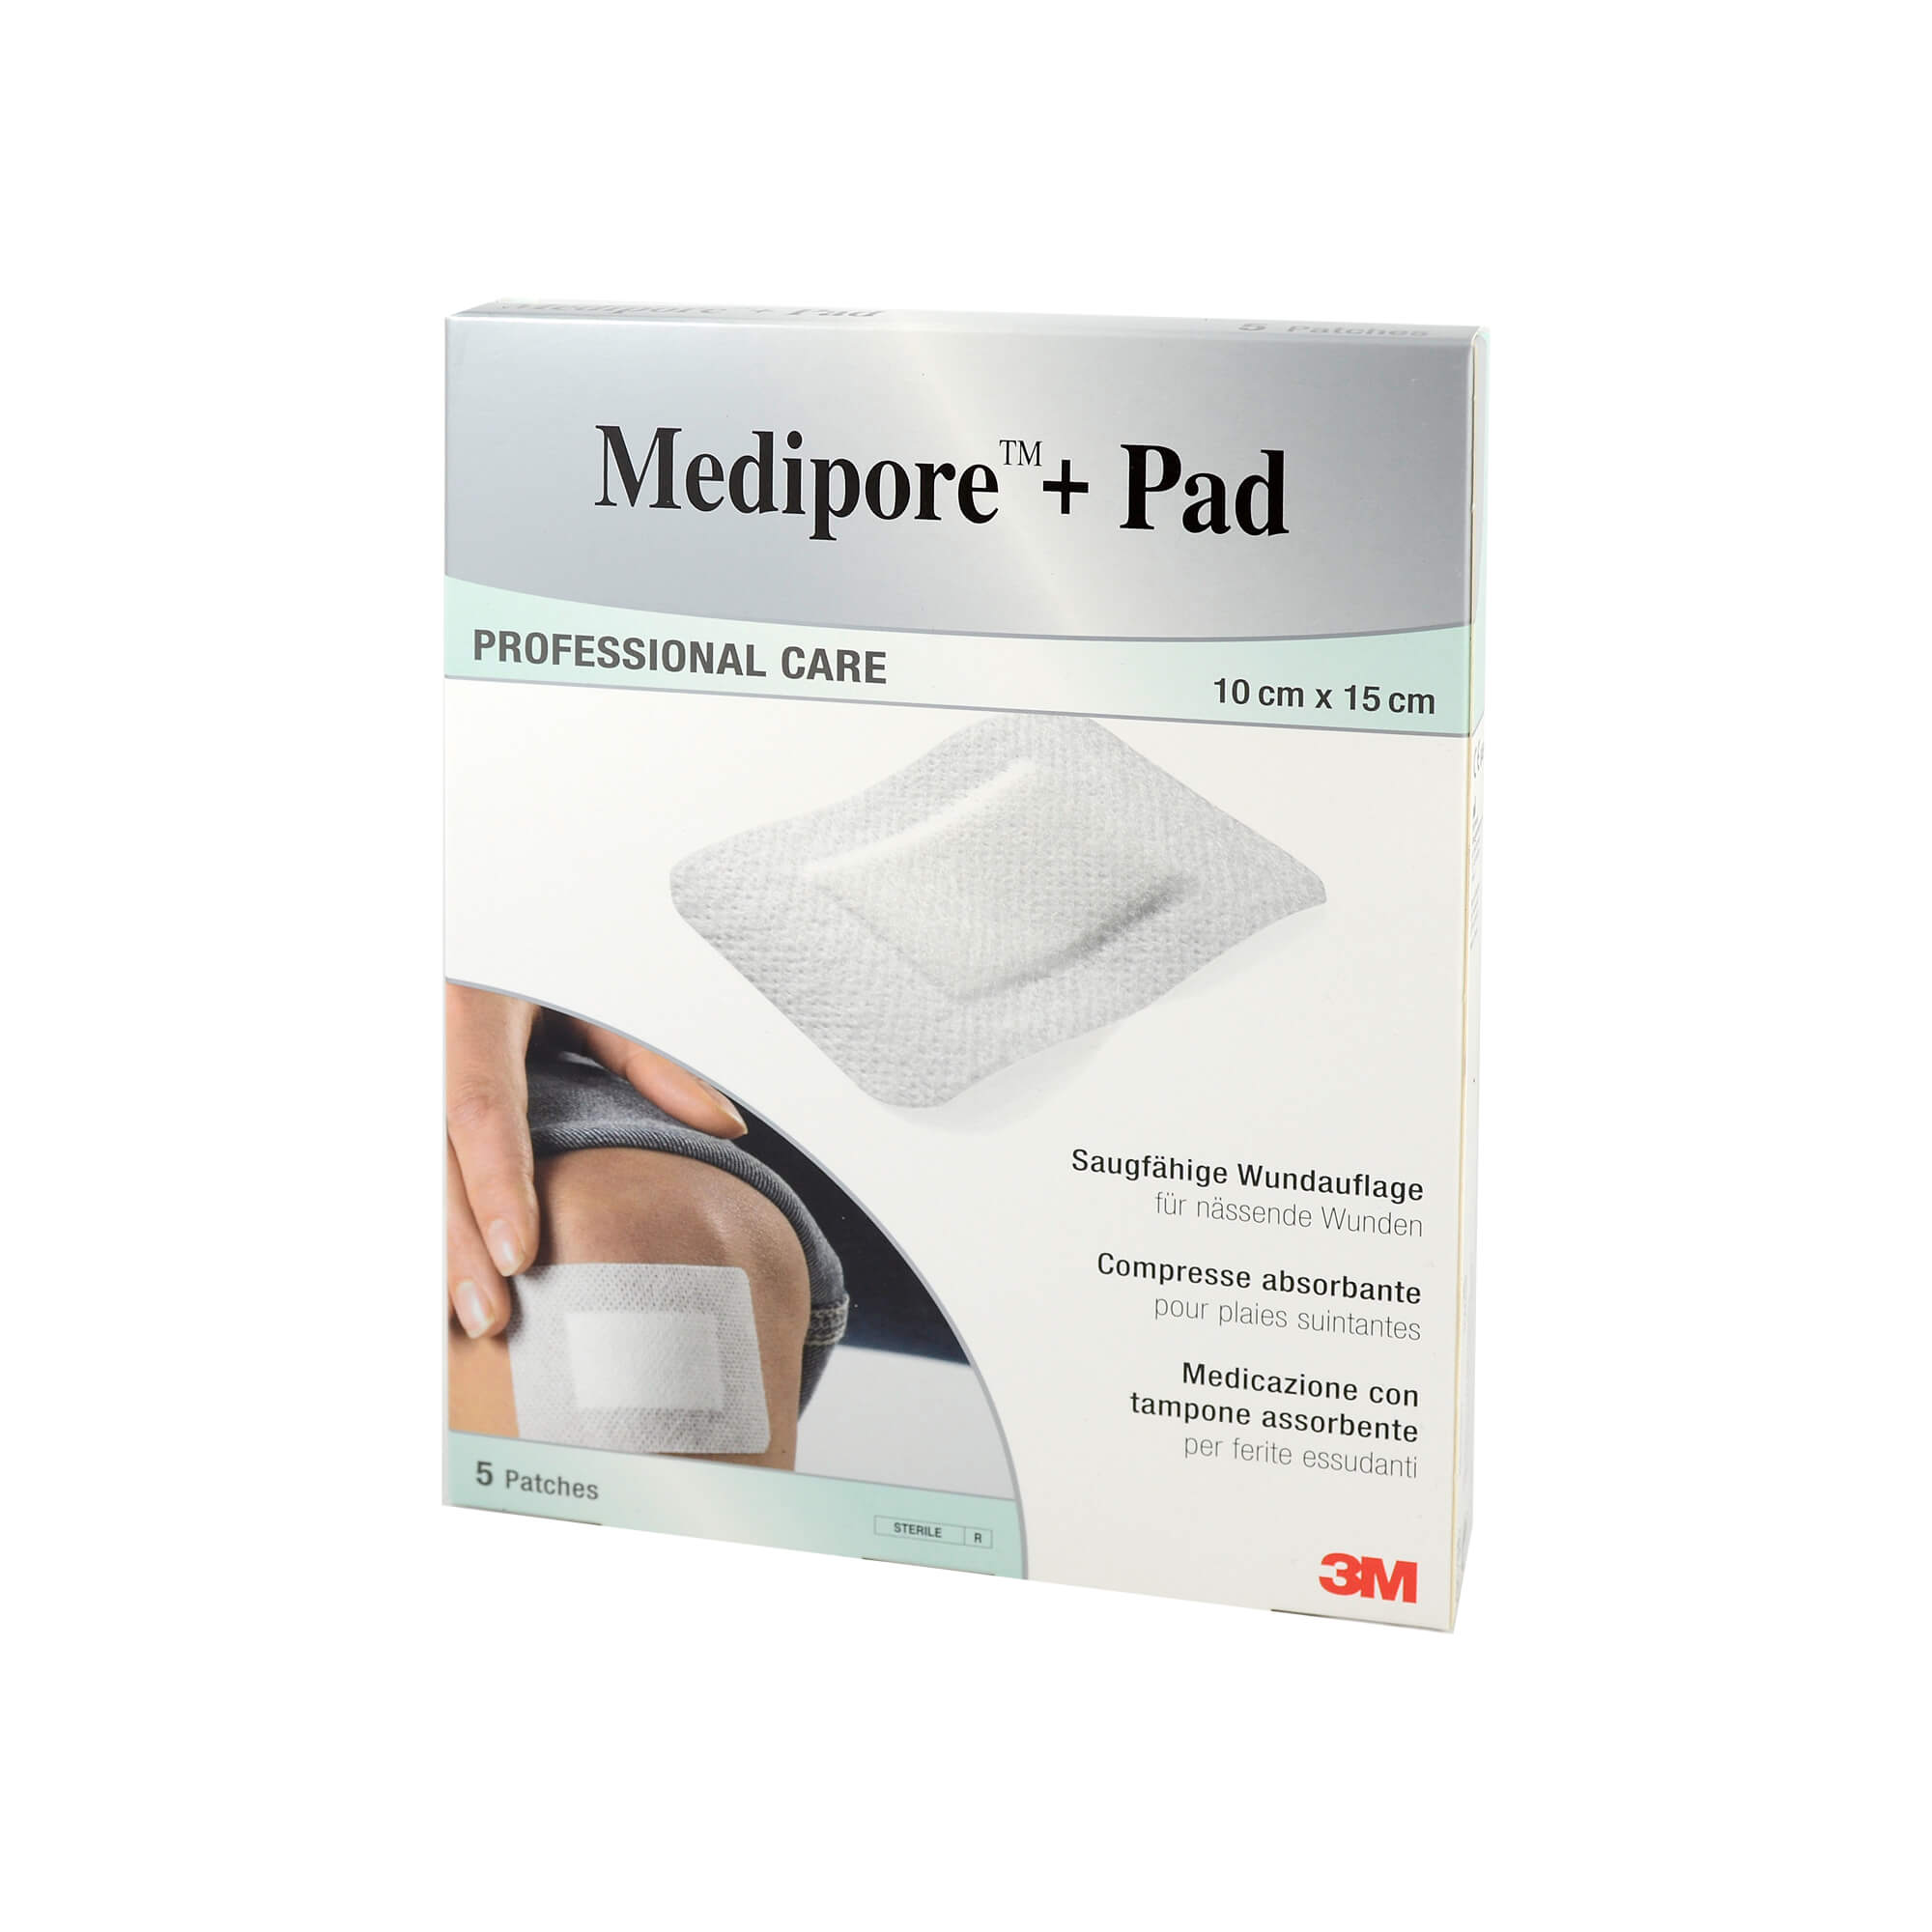 Medipore + Pad 3M 10x15cm 3569np Pflaster